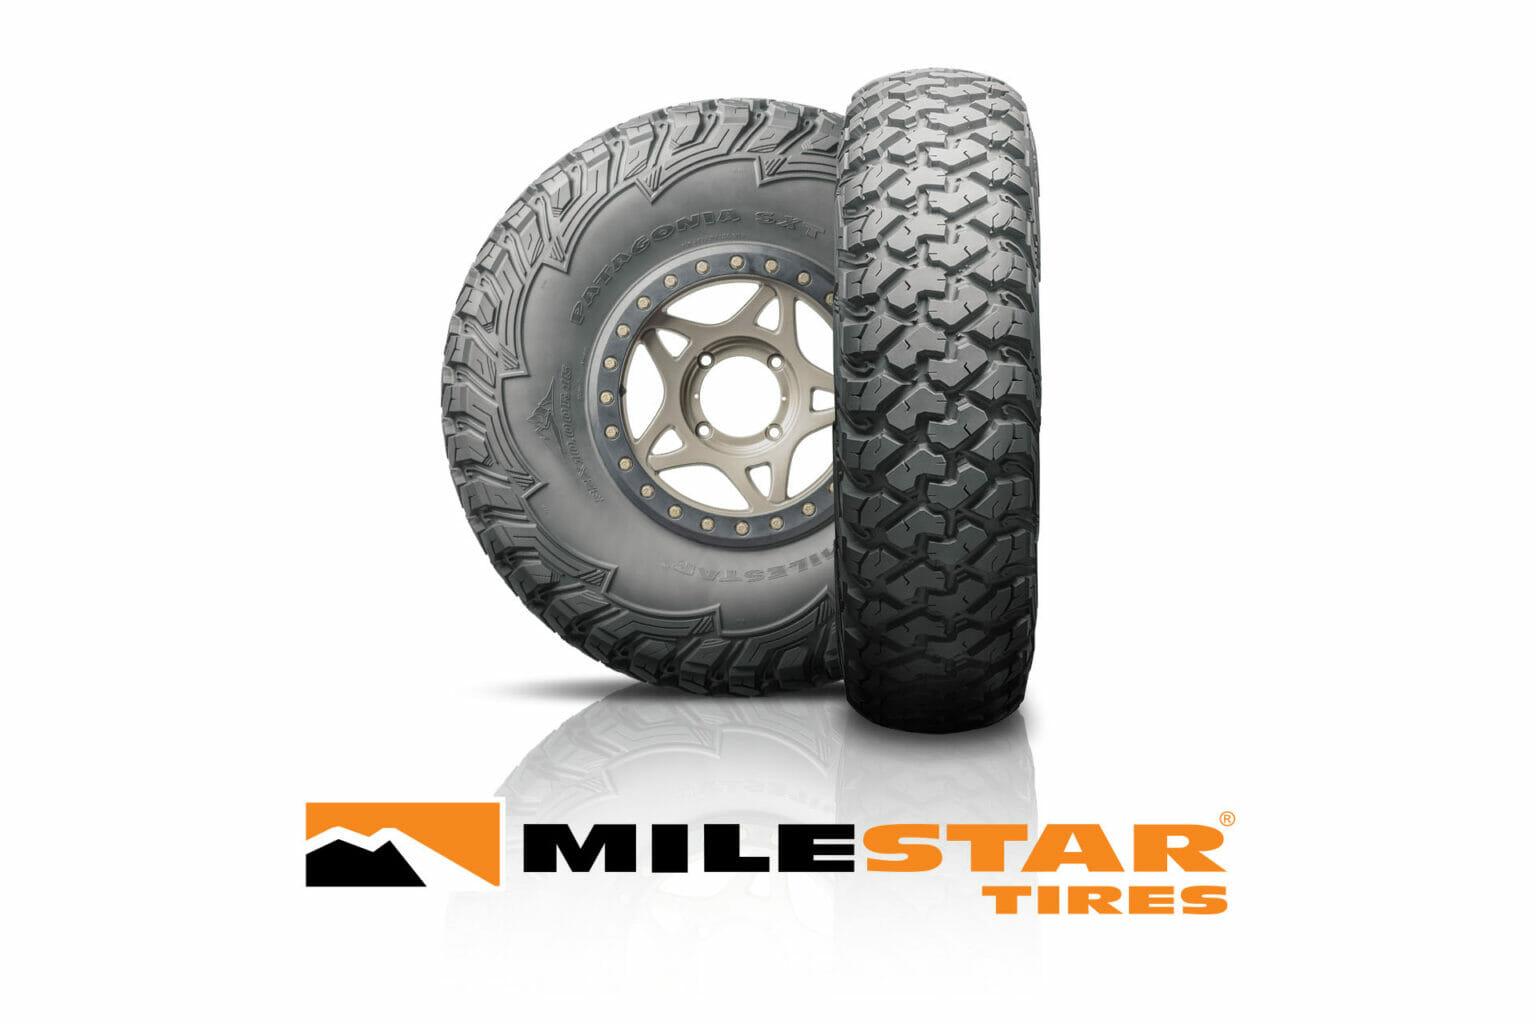 milestar patagonia sxt utv side-by-side tire